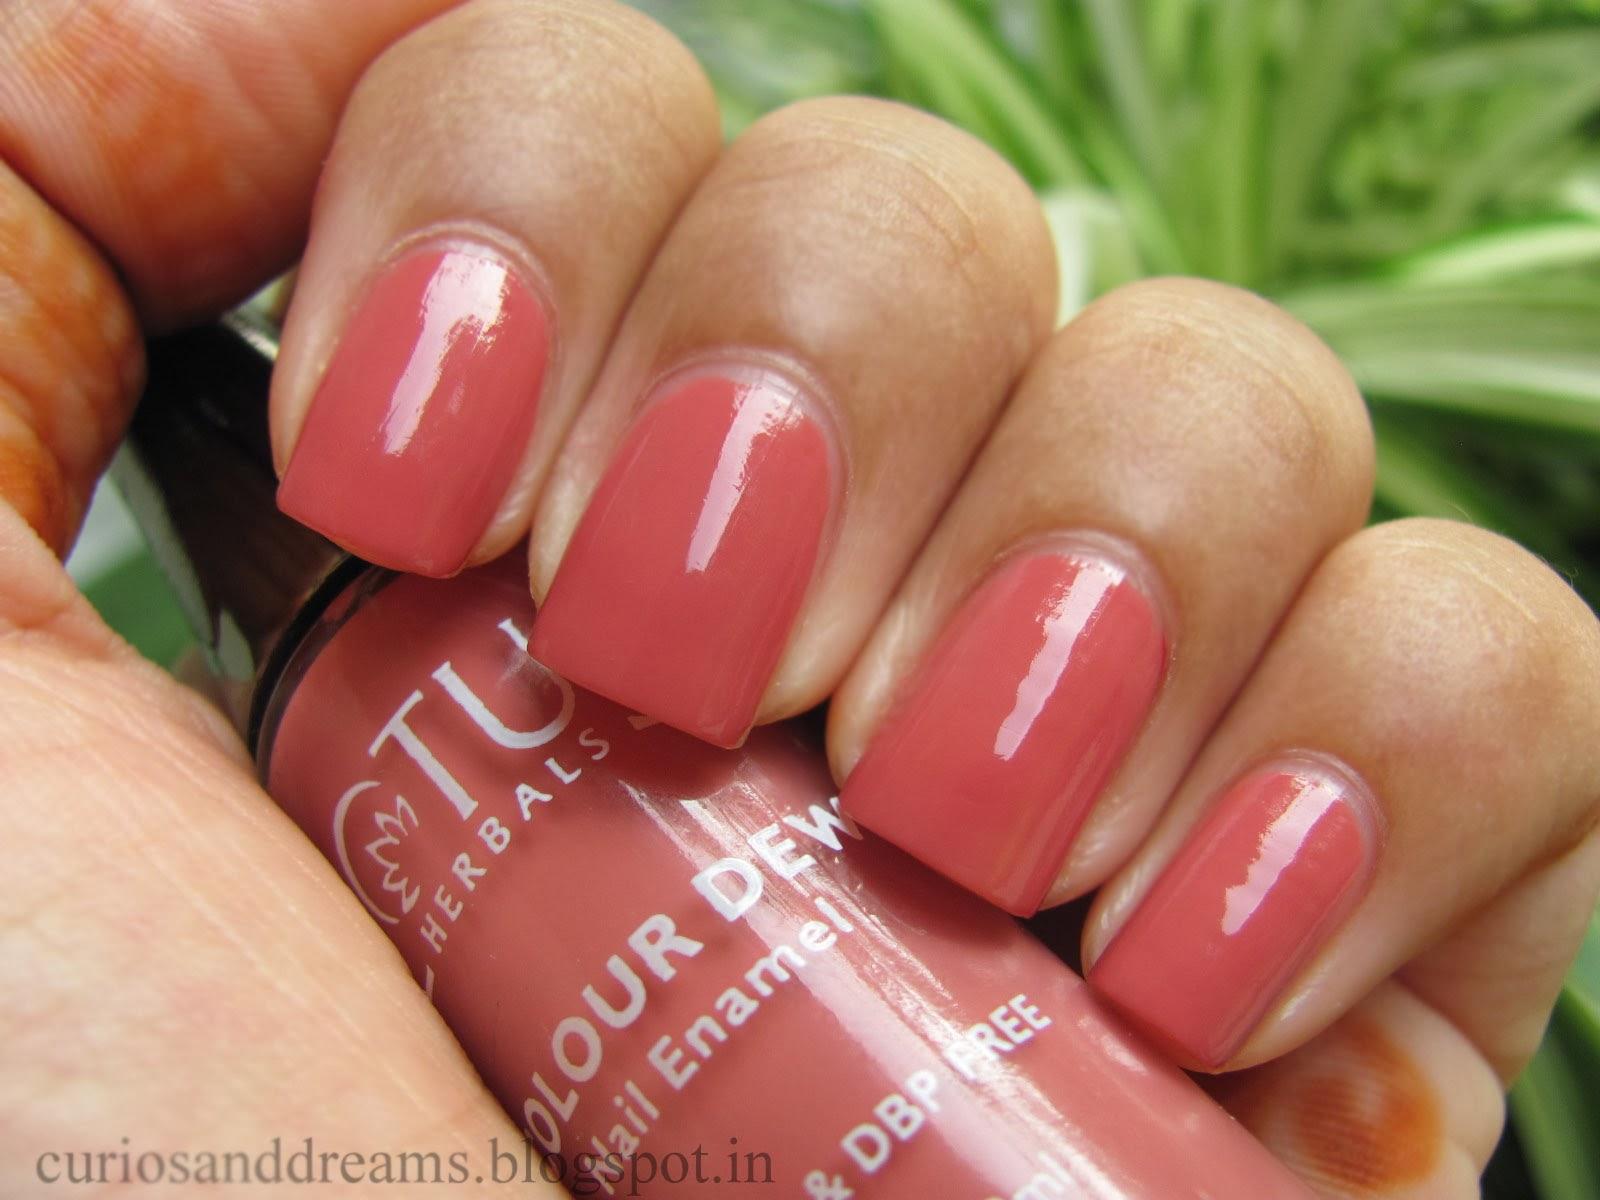 Curios and Dreams | Makeup and Beauty Product Reviews : Lotus ...